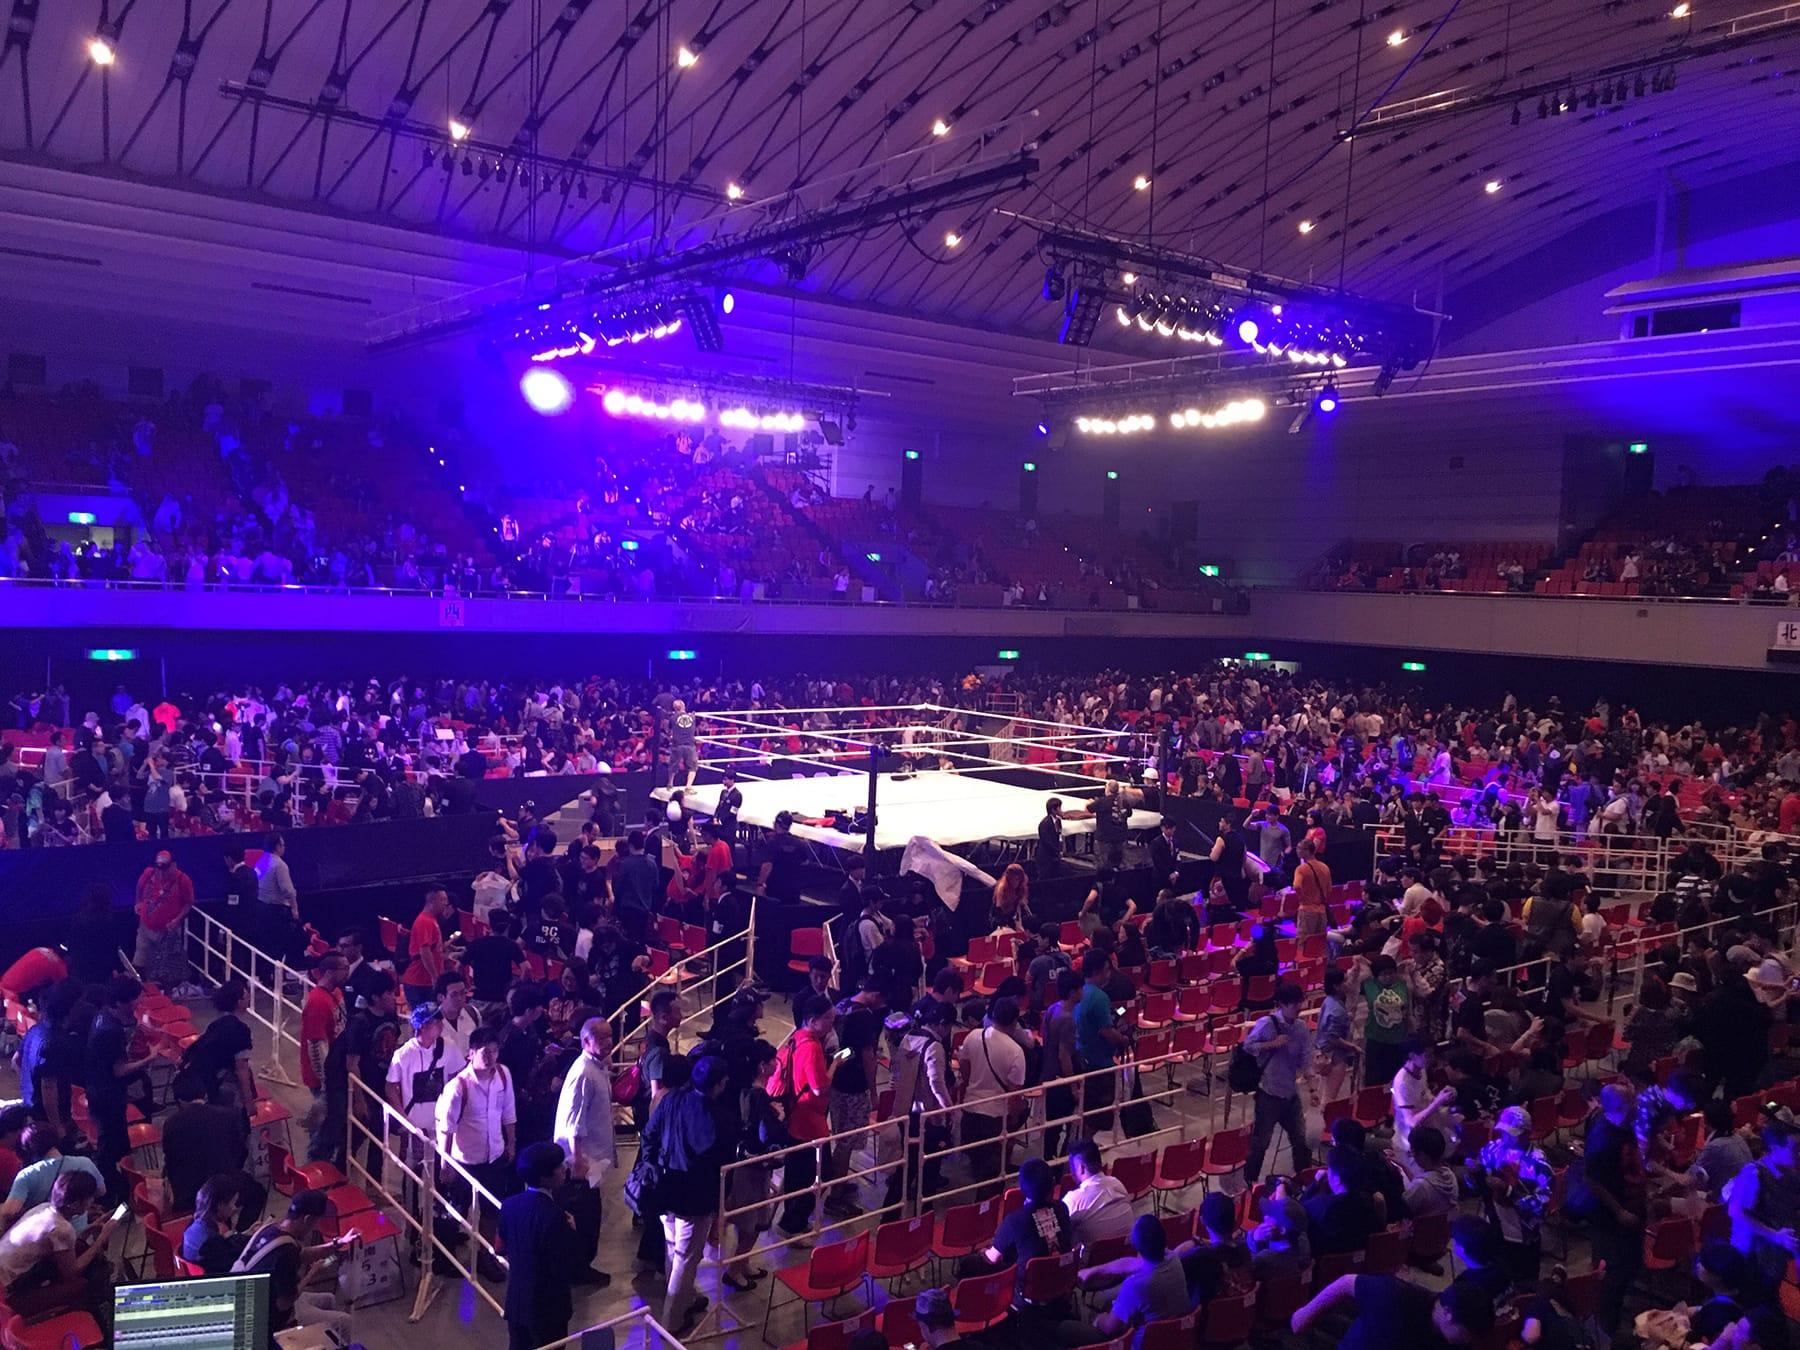 WWE Live Japan 2017 @エディオンアリーナ大阪 観戦レポート